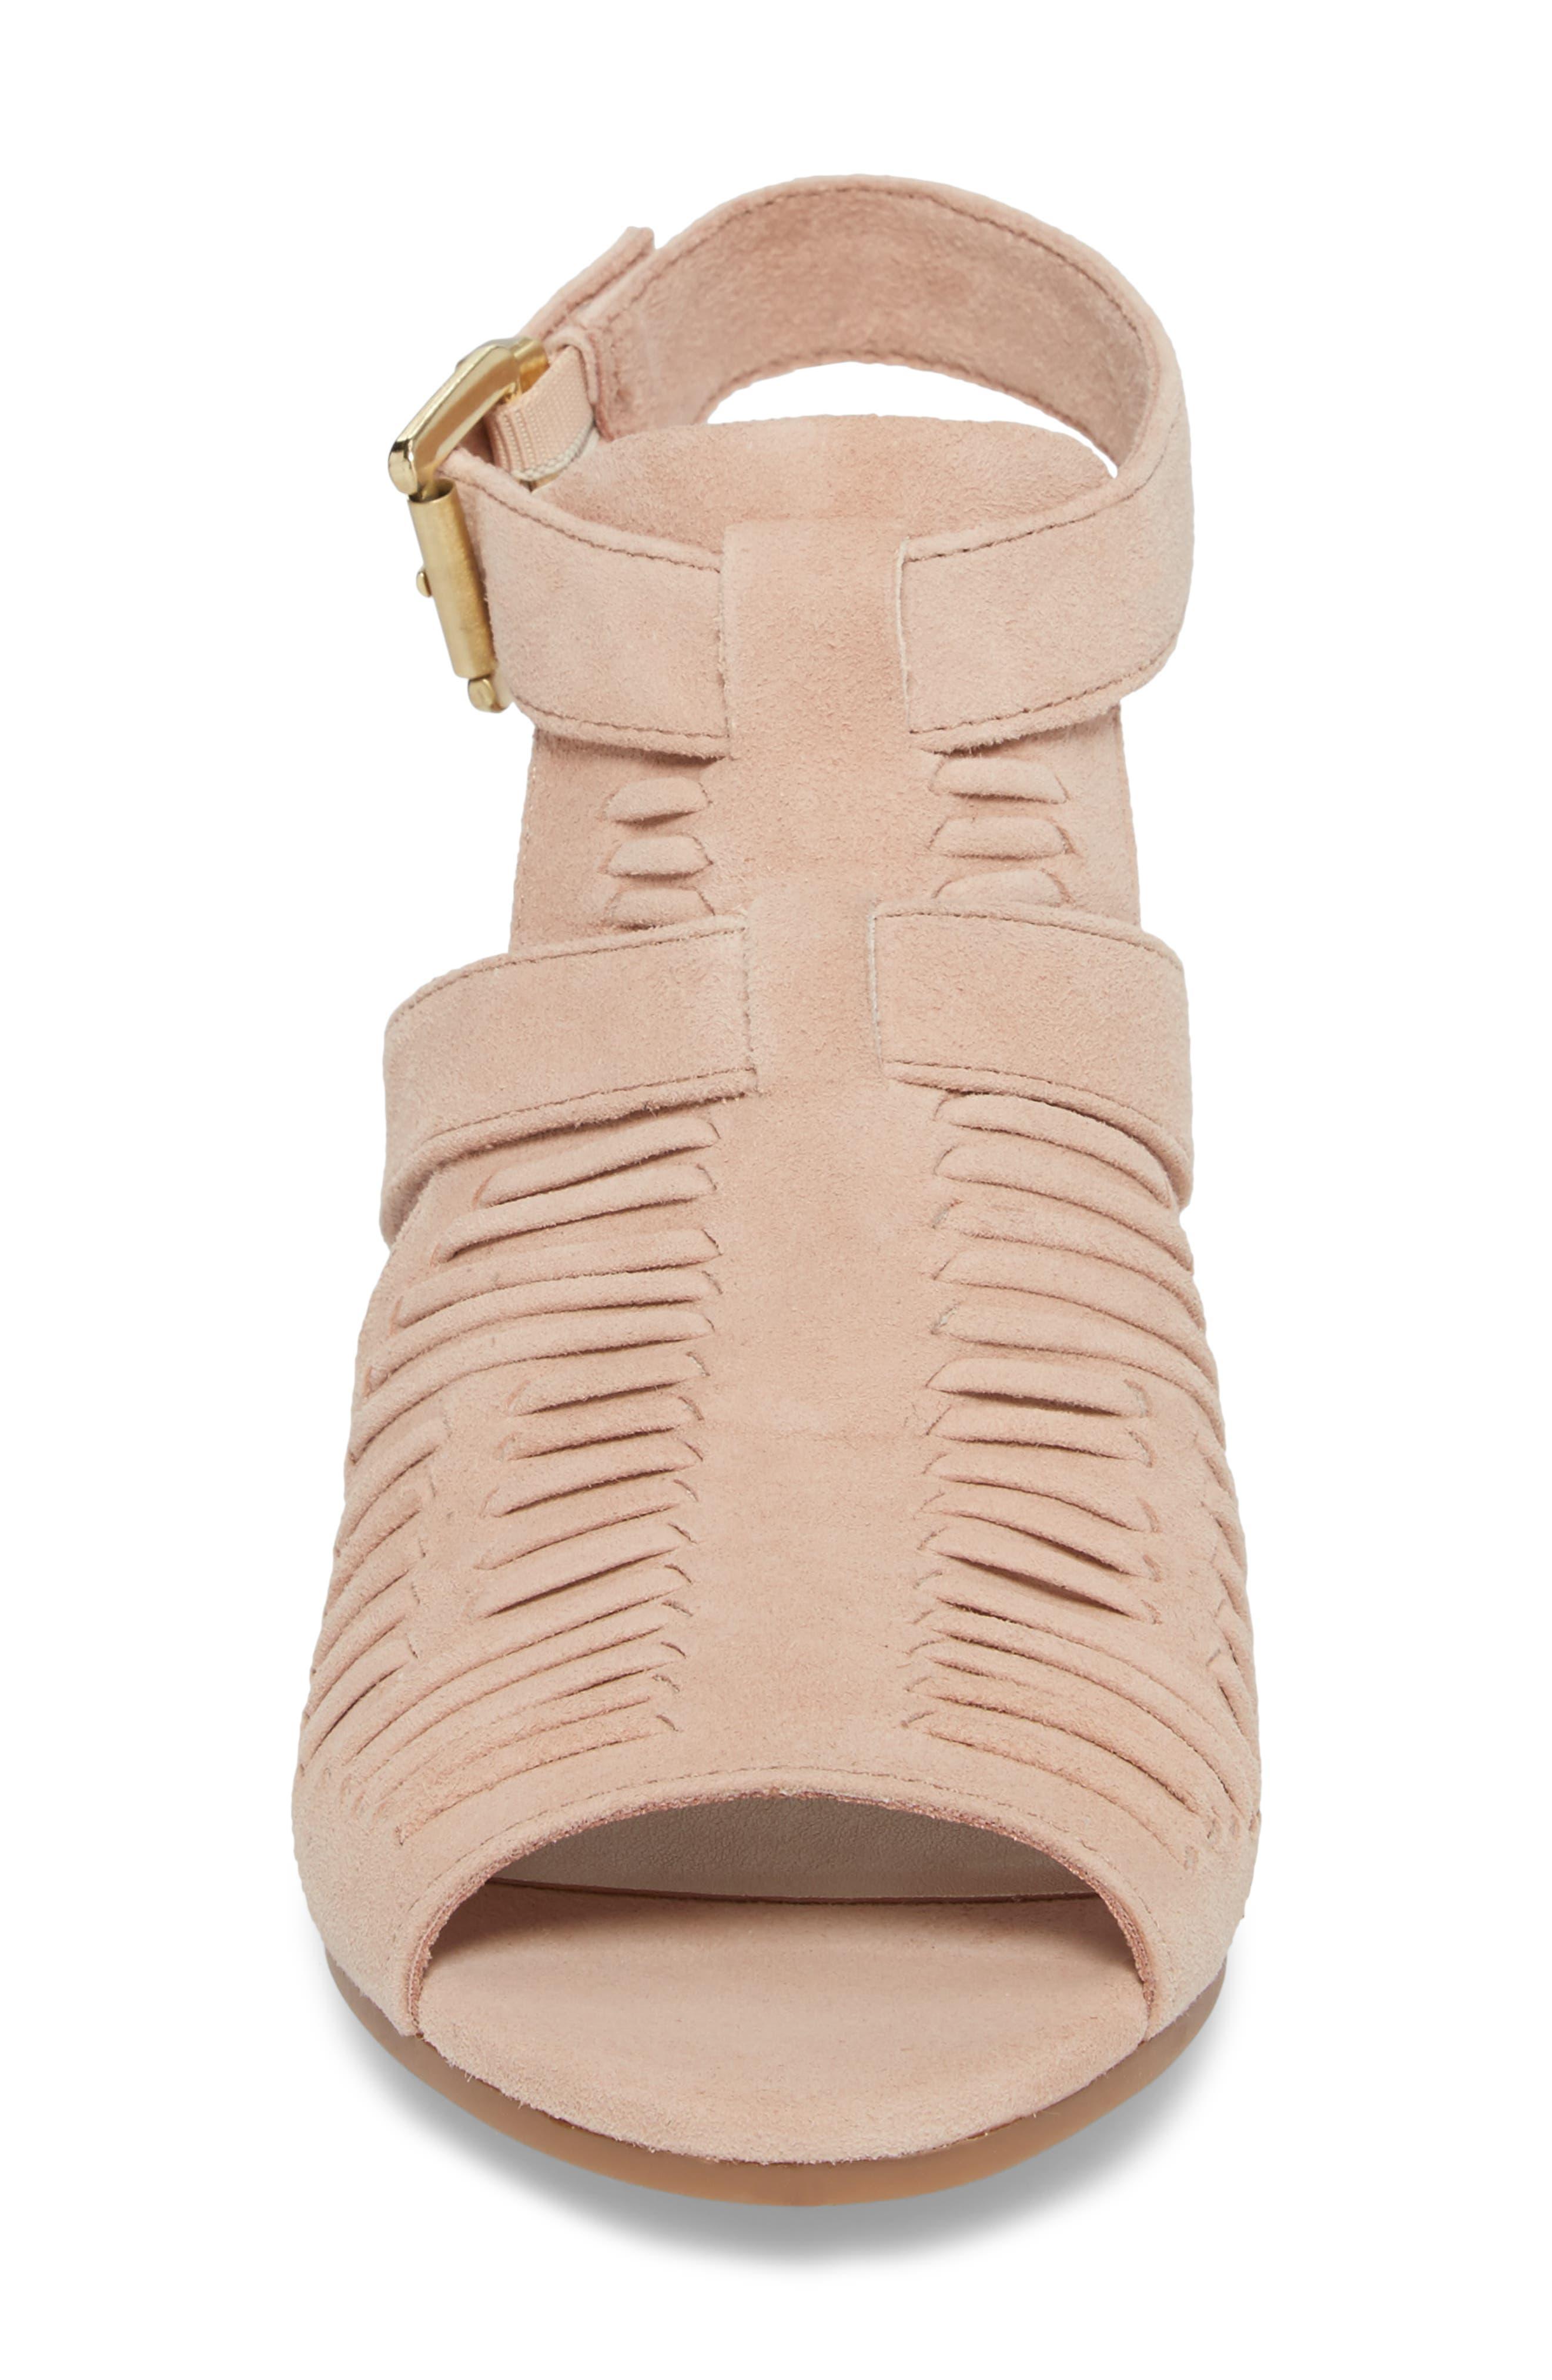 Finley Ankle Strap Sandal,                             Alternate thumbnail 20, color,